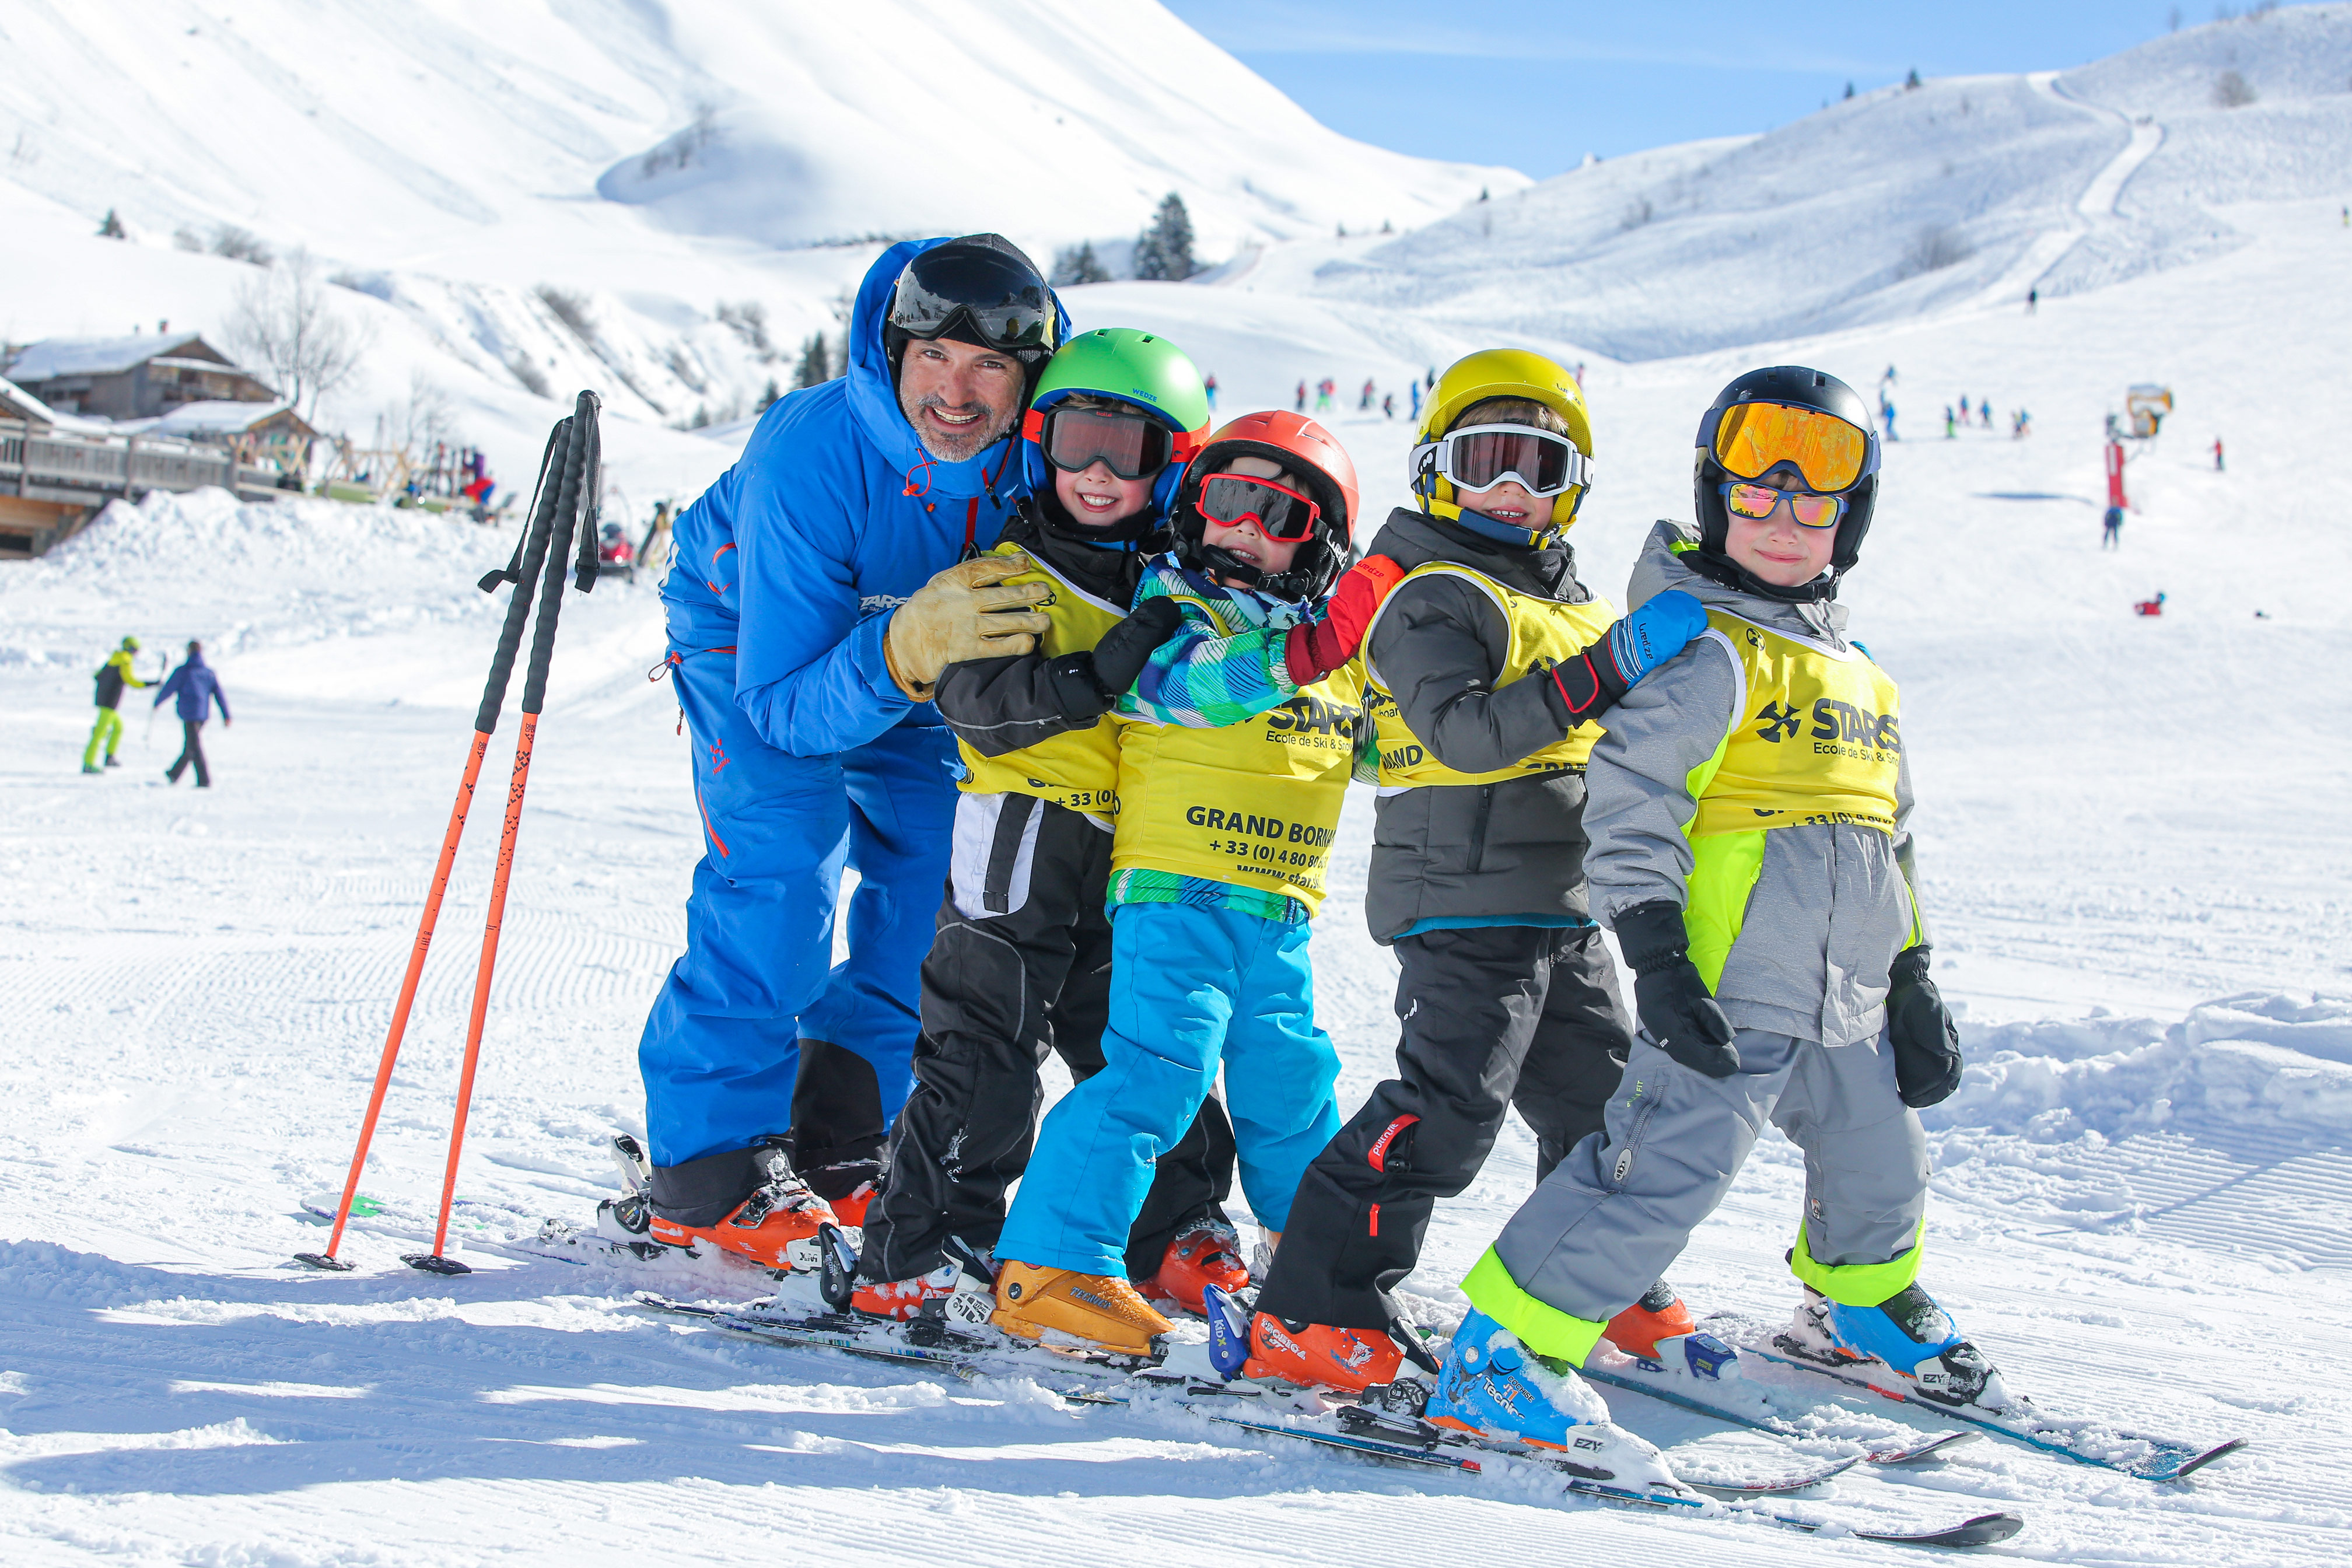 Oxygene's children group ski lessons